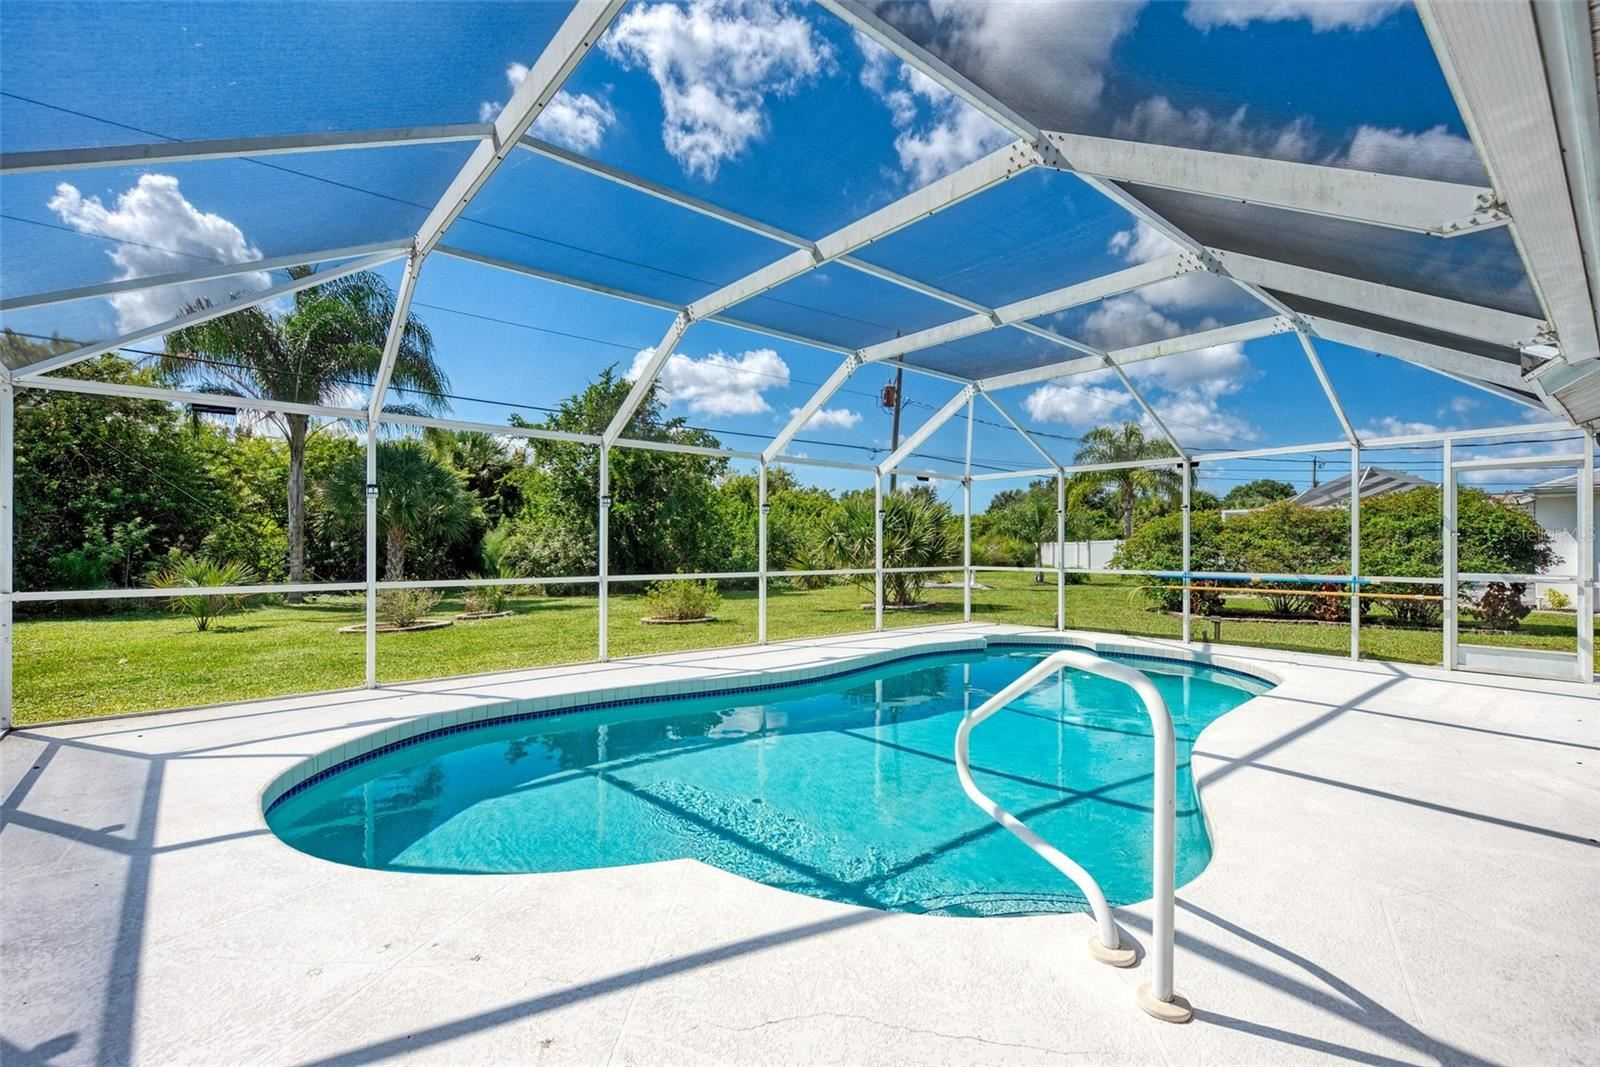 Photo of 10271 WINSTEAD AVENUE, ENGLEWOOD, FL 34224 (MLS # D6121742)